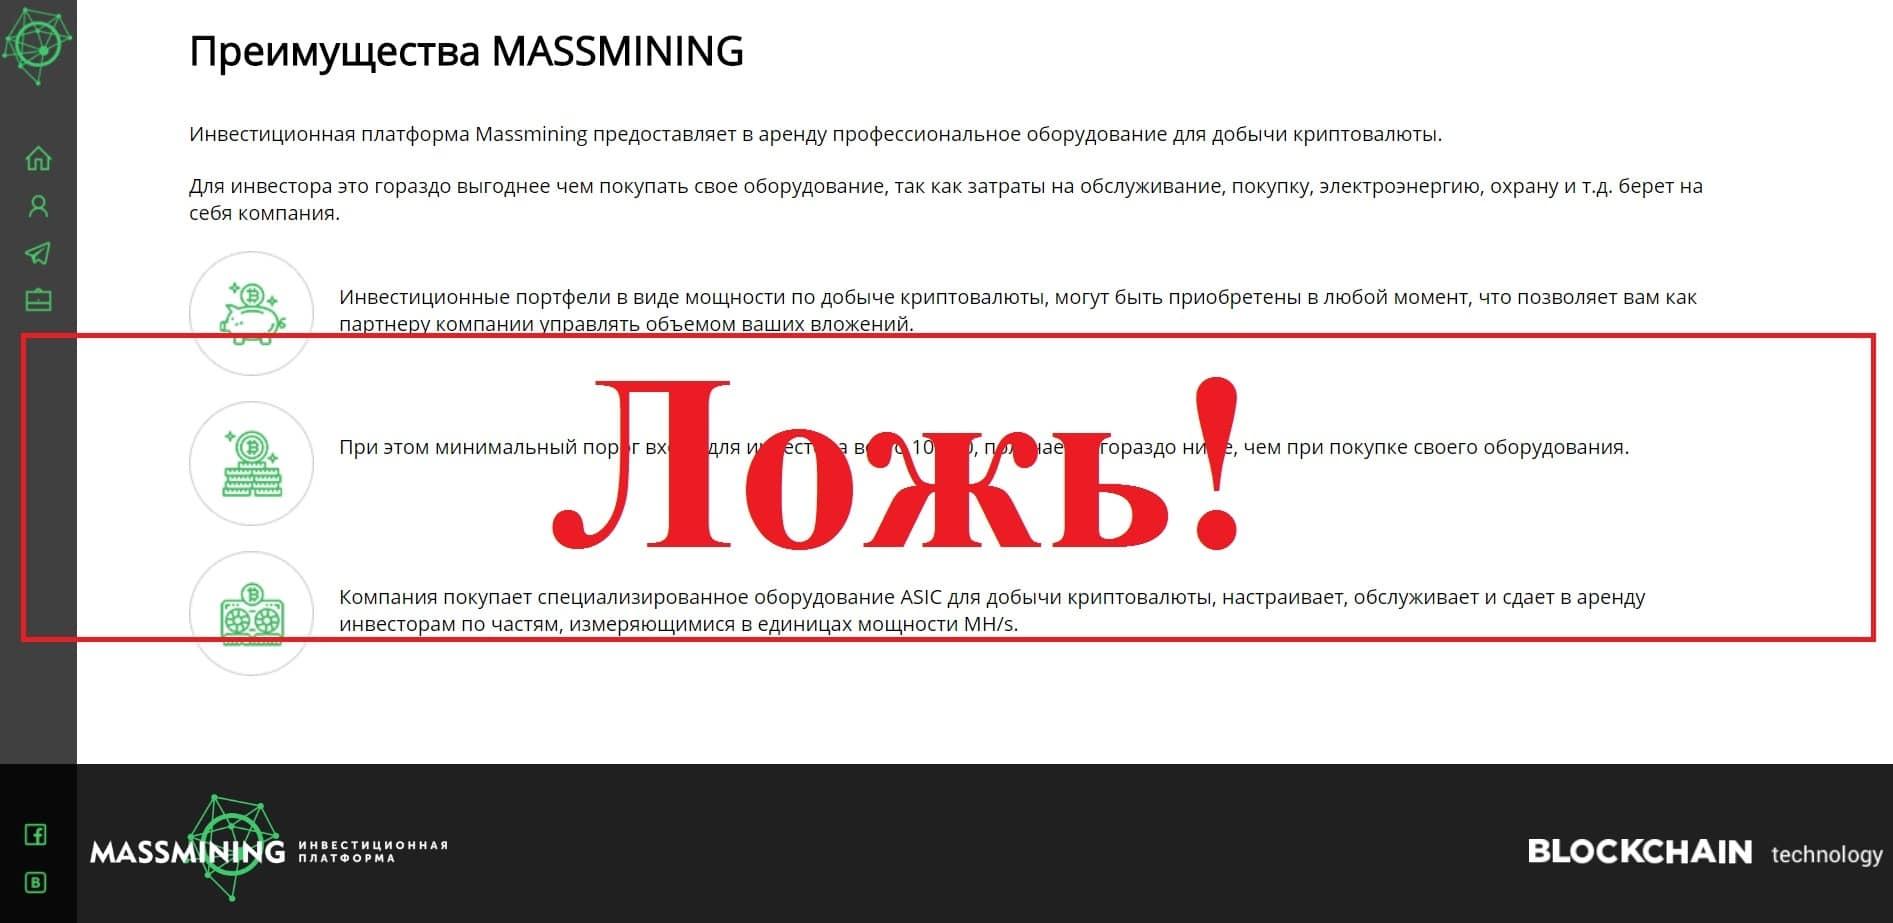 MassMining (massmining.pro) – отзывы и обзор майнинга